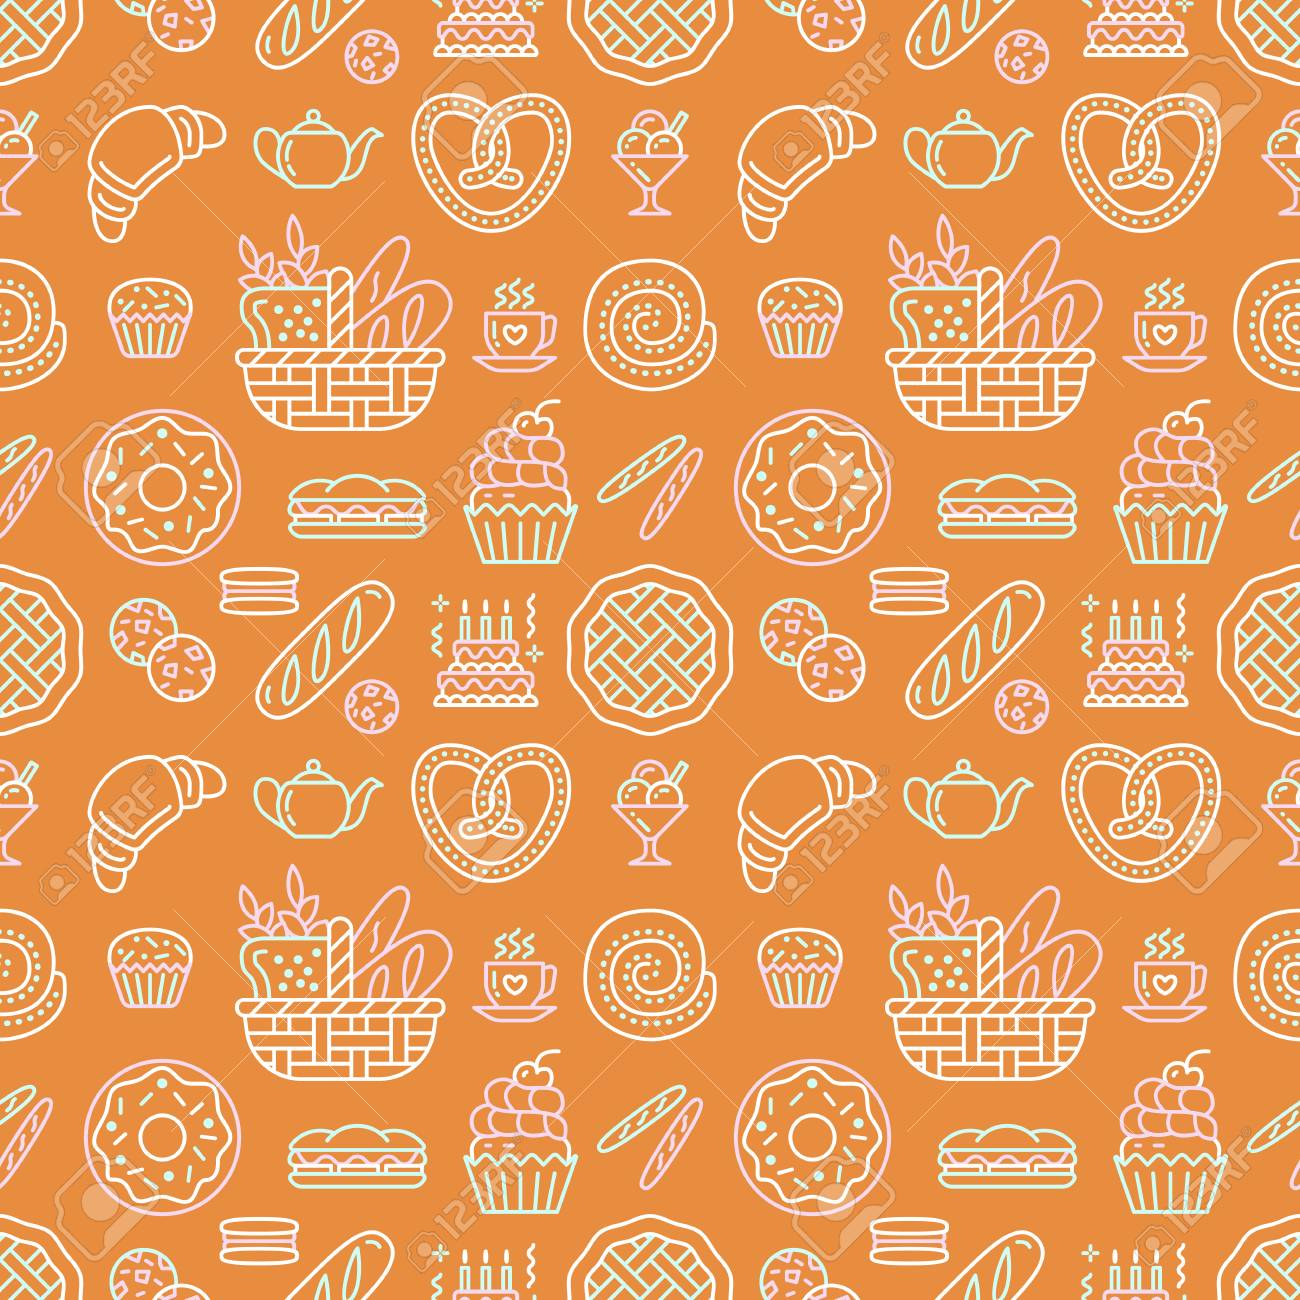 Bakery seamless pattern, food vector background of beige orange